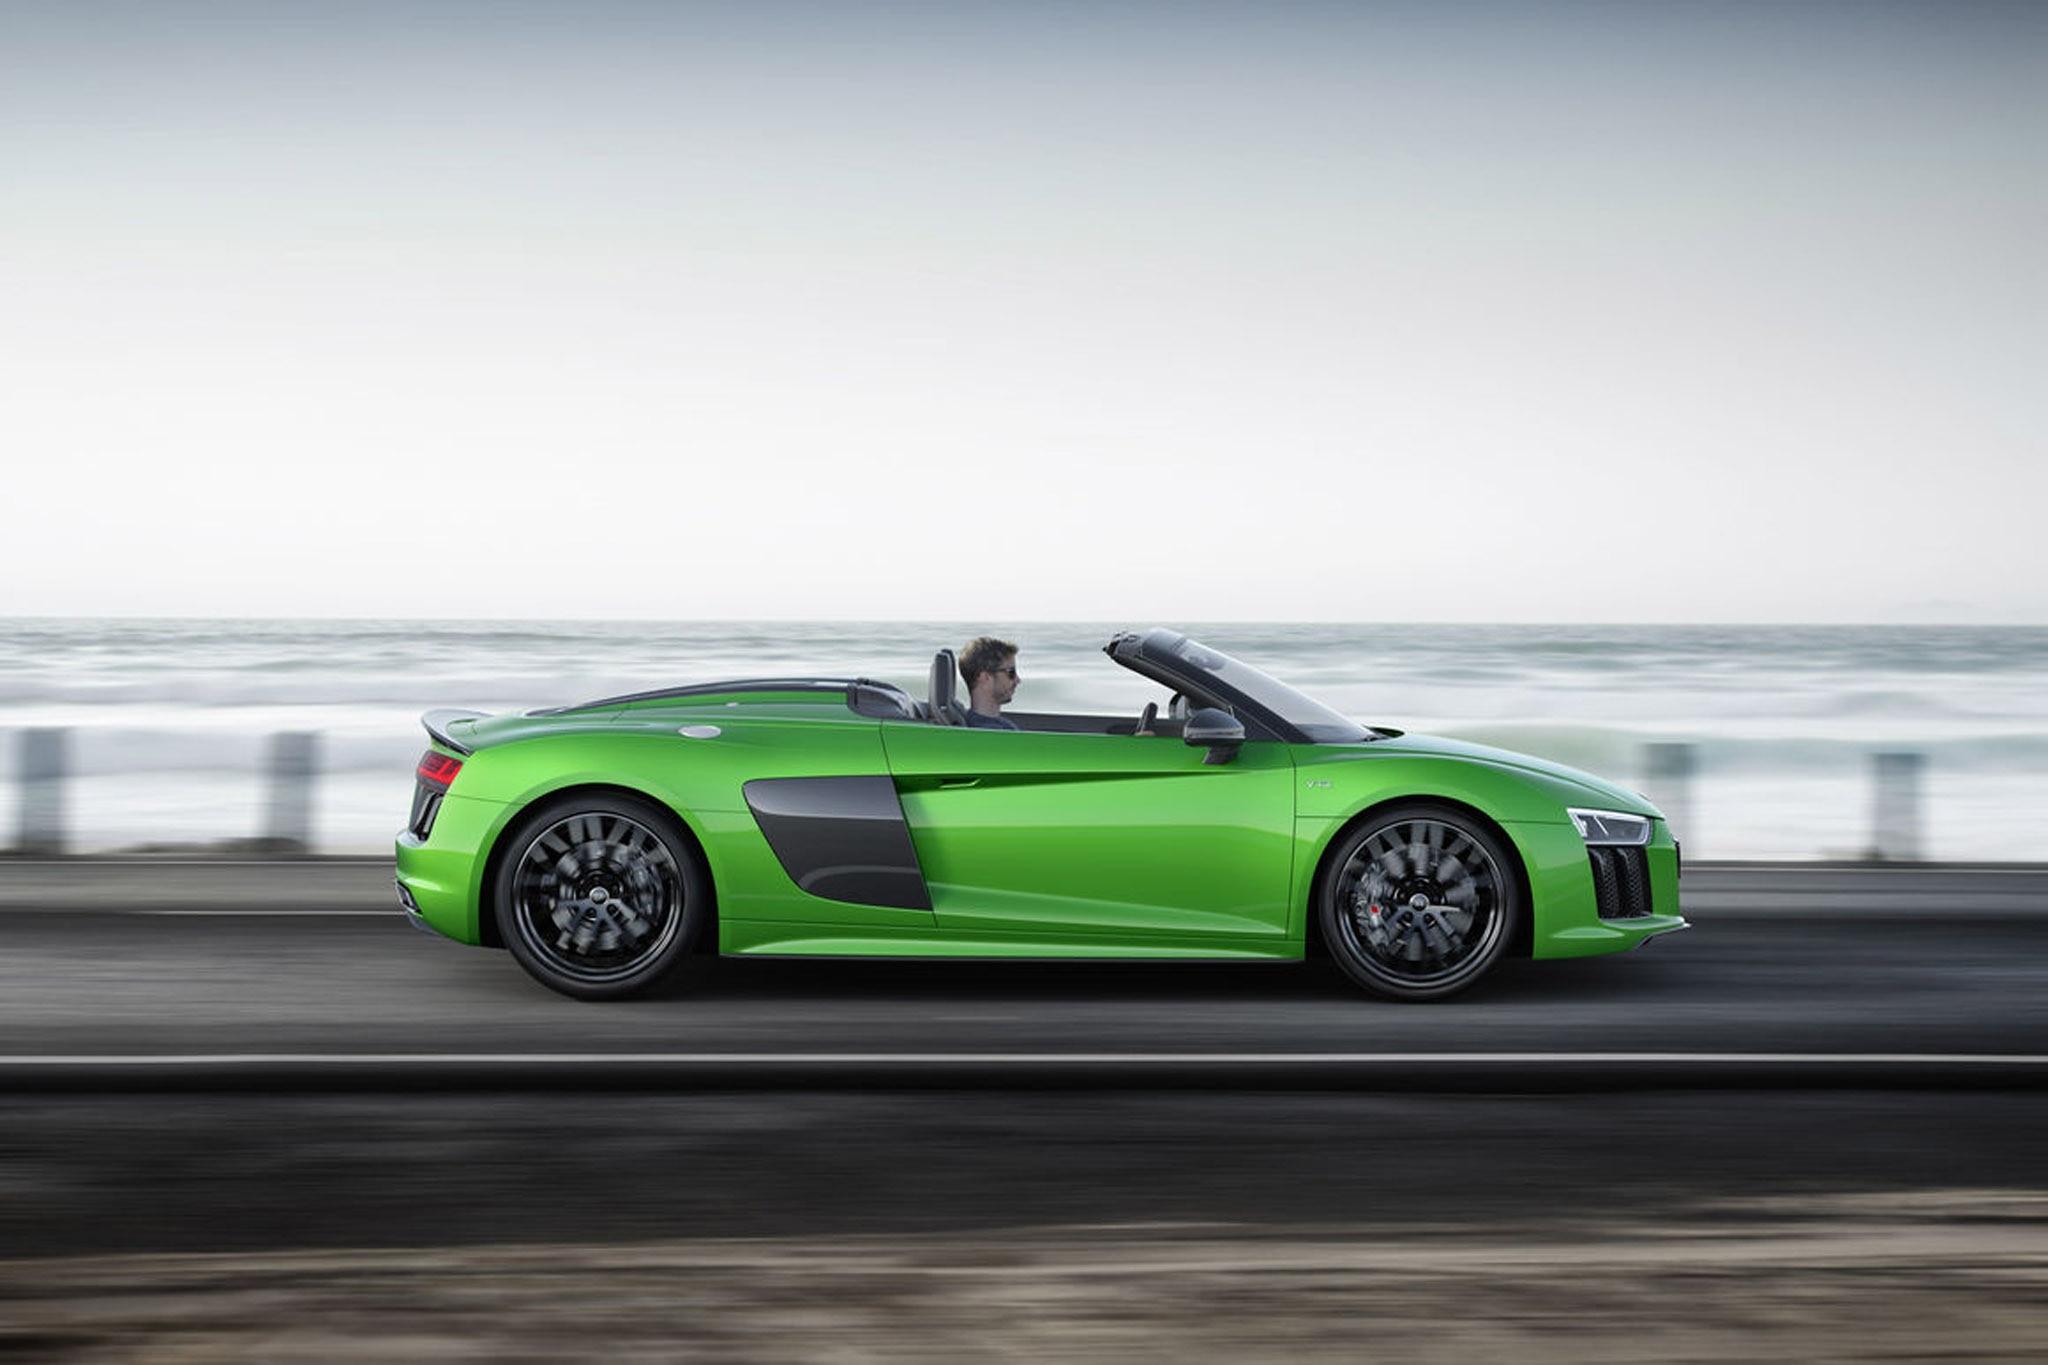 2018 audi r8 spyder v10 plus drops with 610 horsepower | automobile